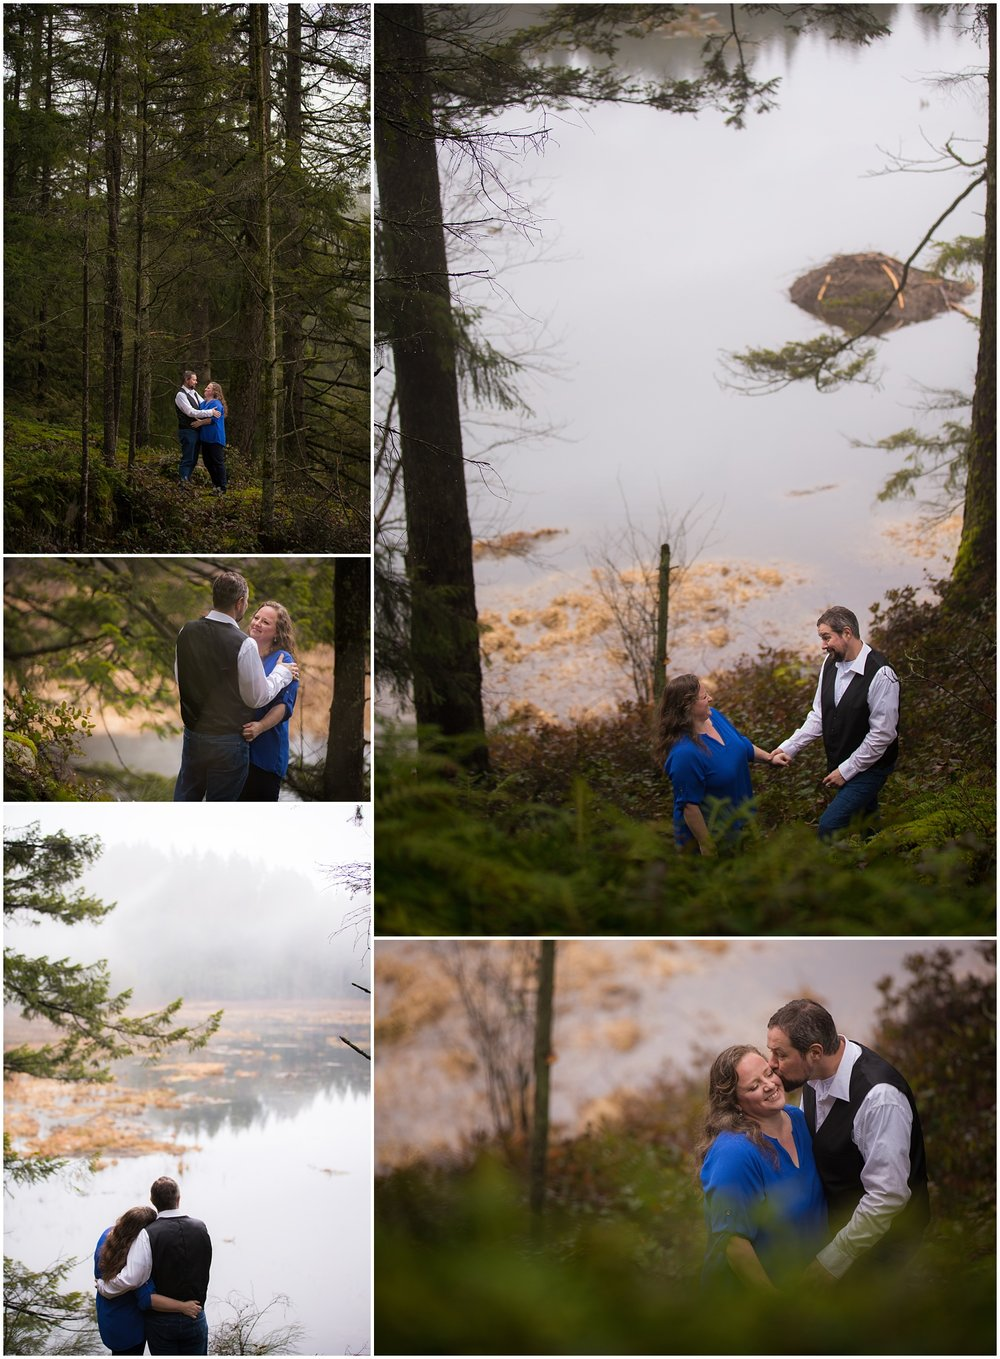 Amazing Day Photography - Minnekhada Engagment Session - Langley Engagement Photographer - Langley Wedding Photographer - Coquitlam Engagement Session (4).jpg